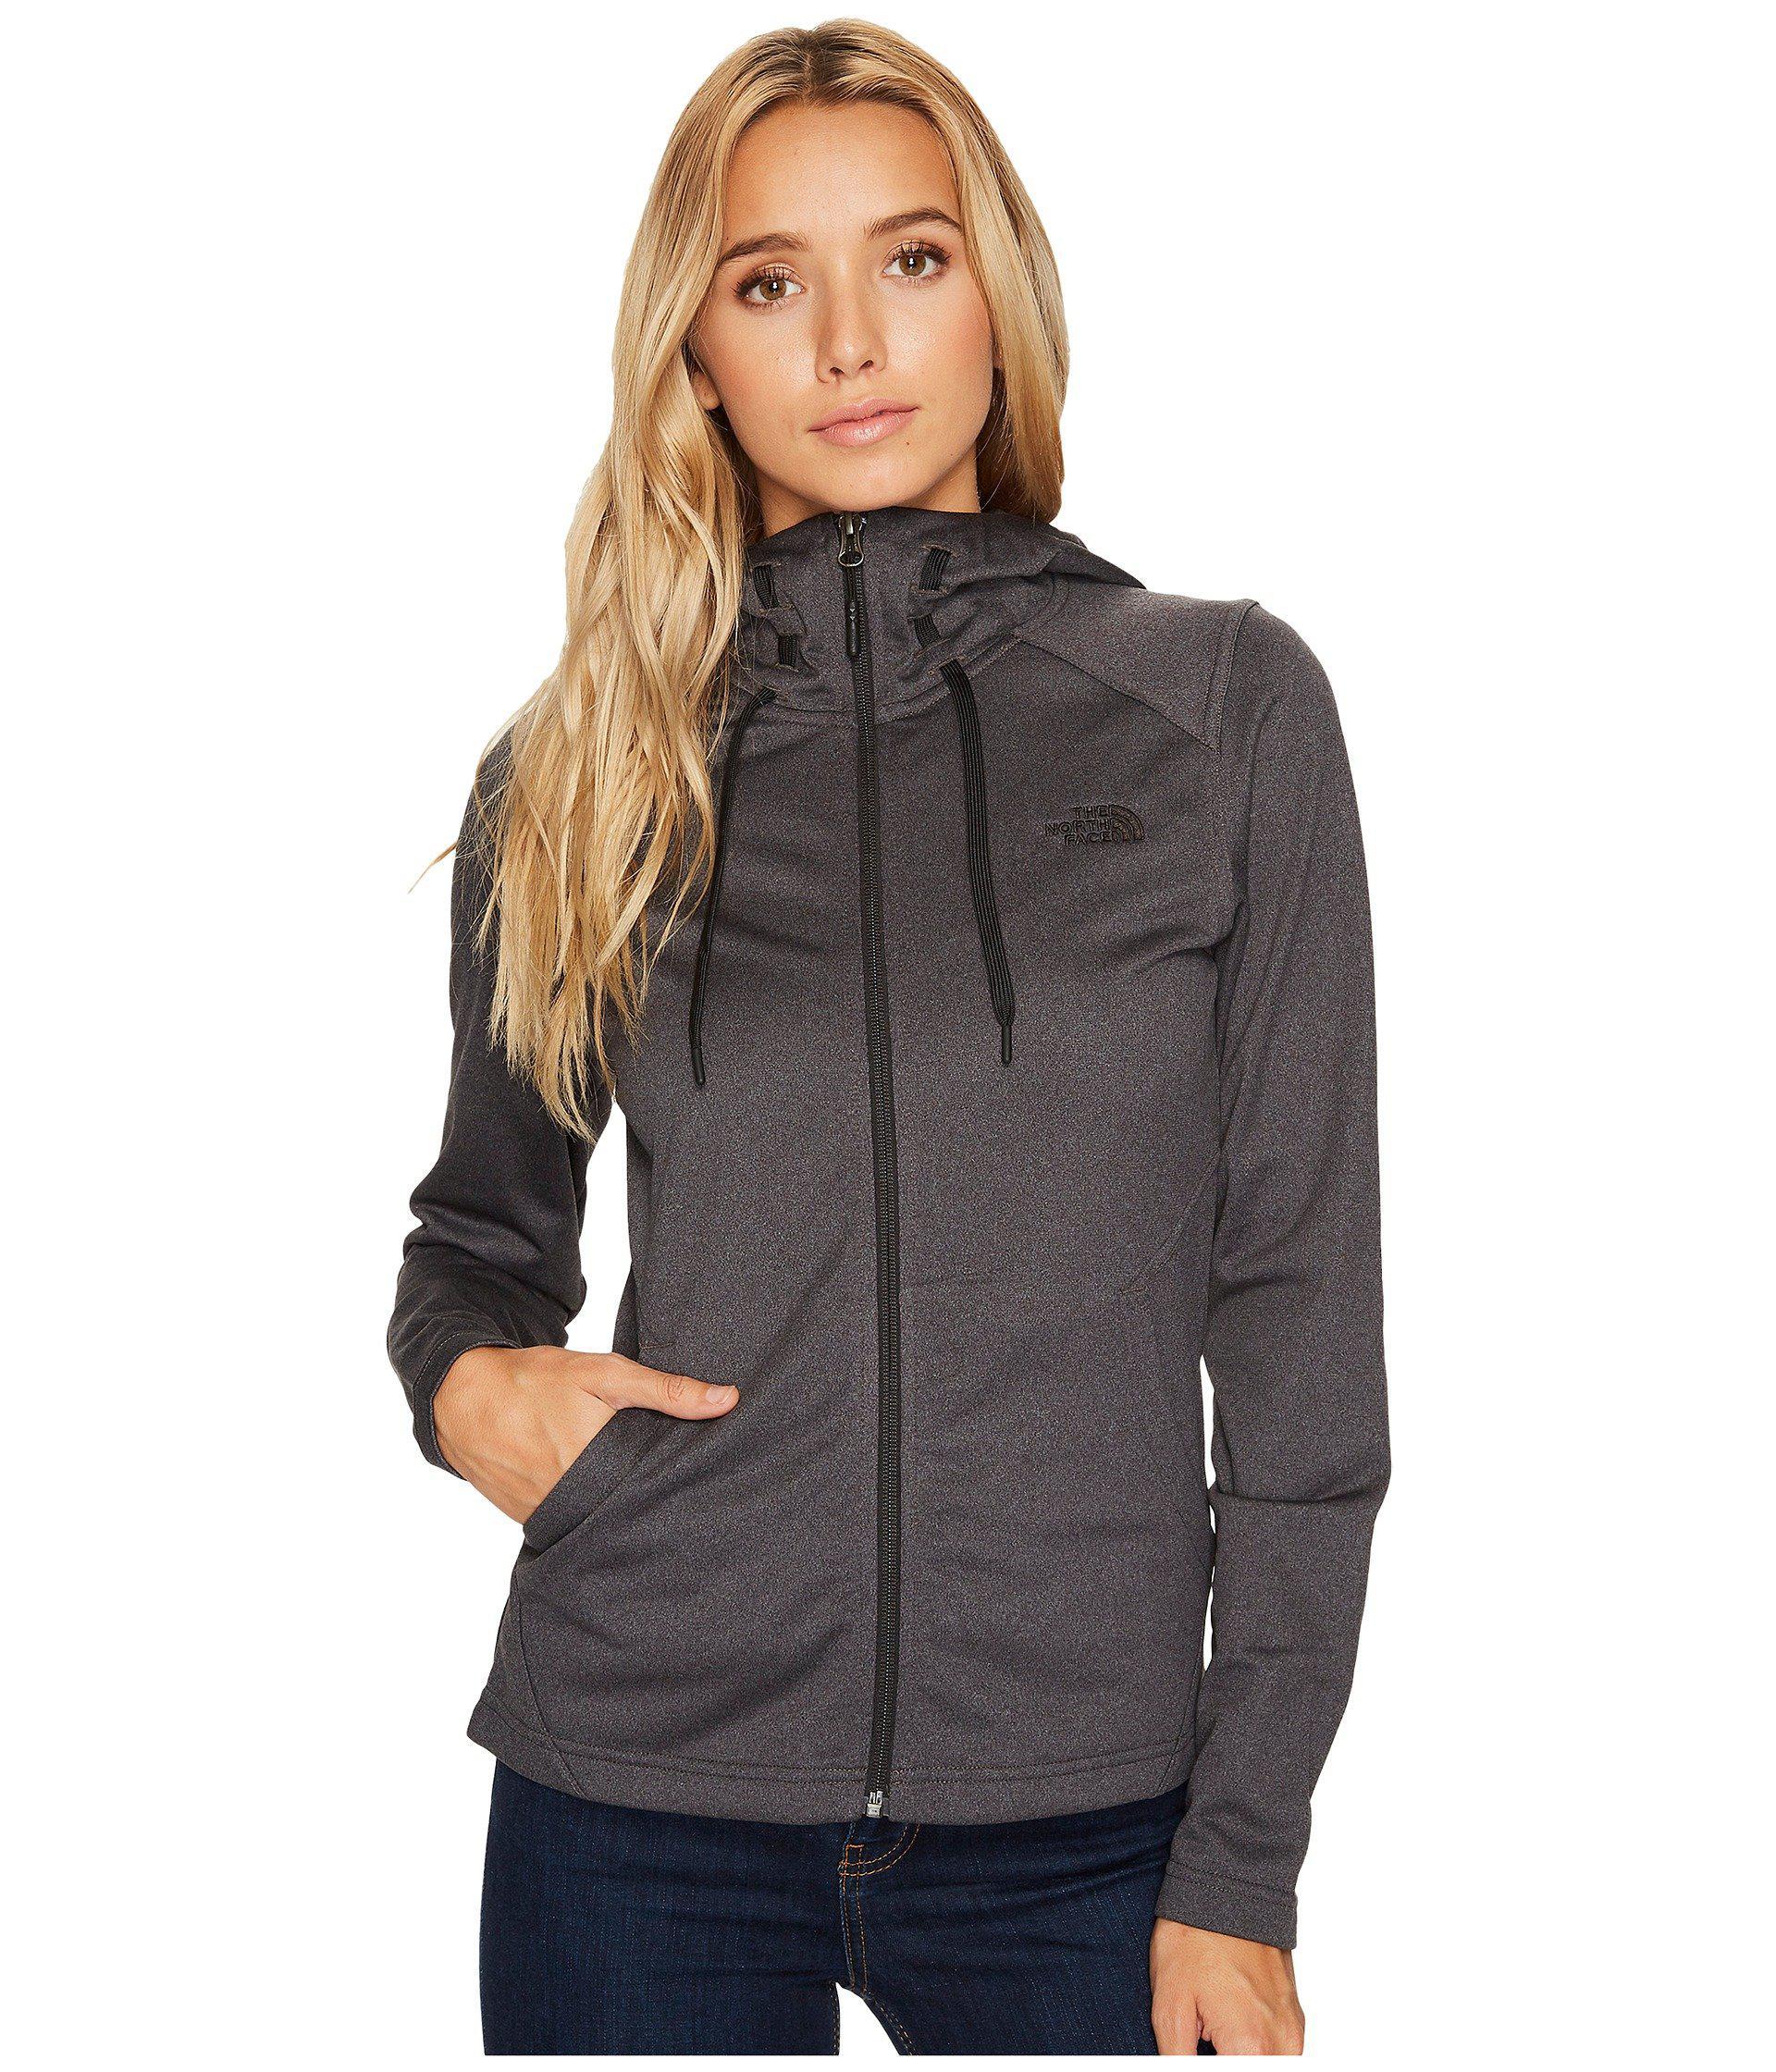 753305773 The North Face Gray Tech Mezzaluna Hoodie (tnf Black) Women's Sweatshirt